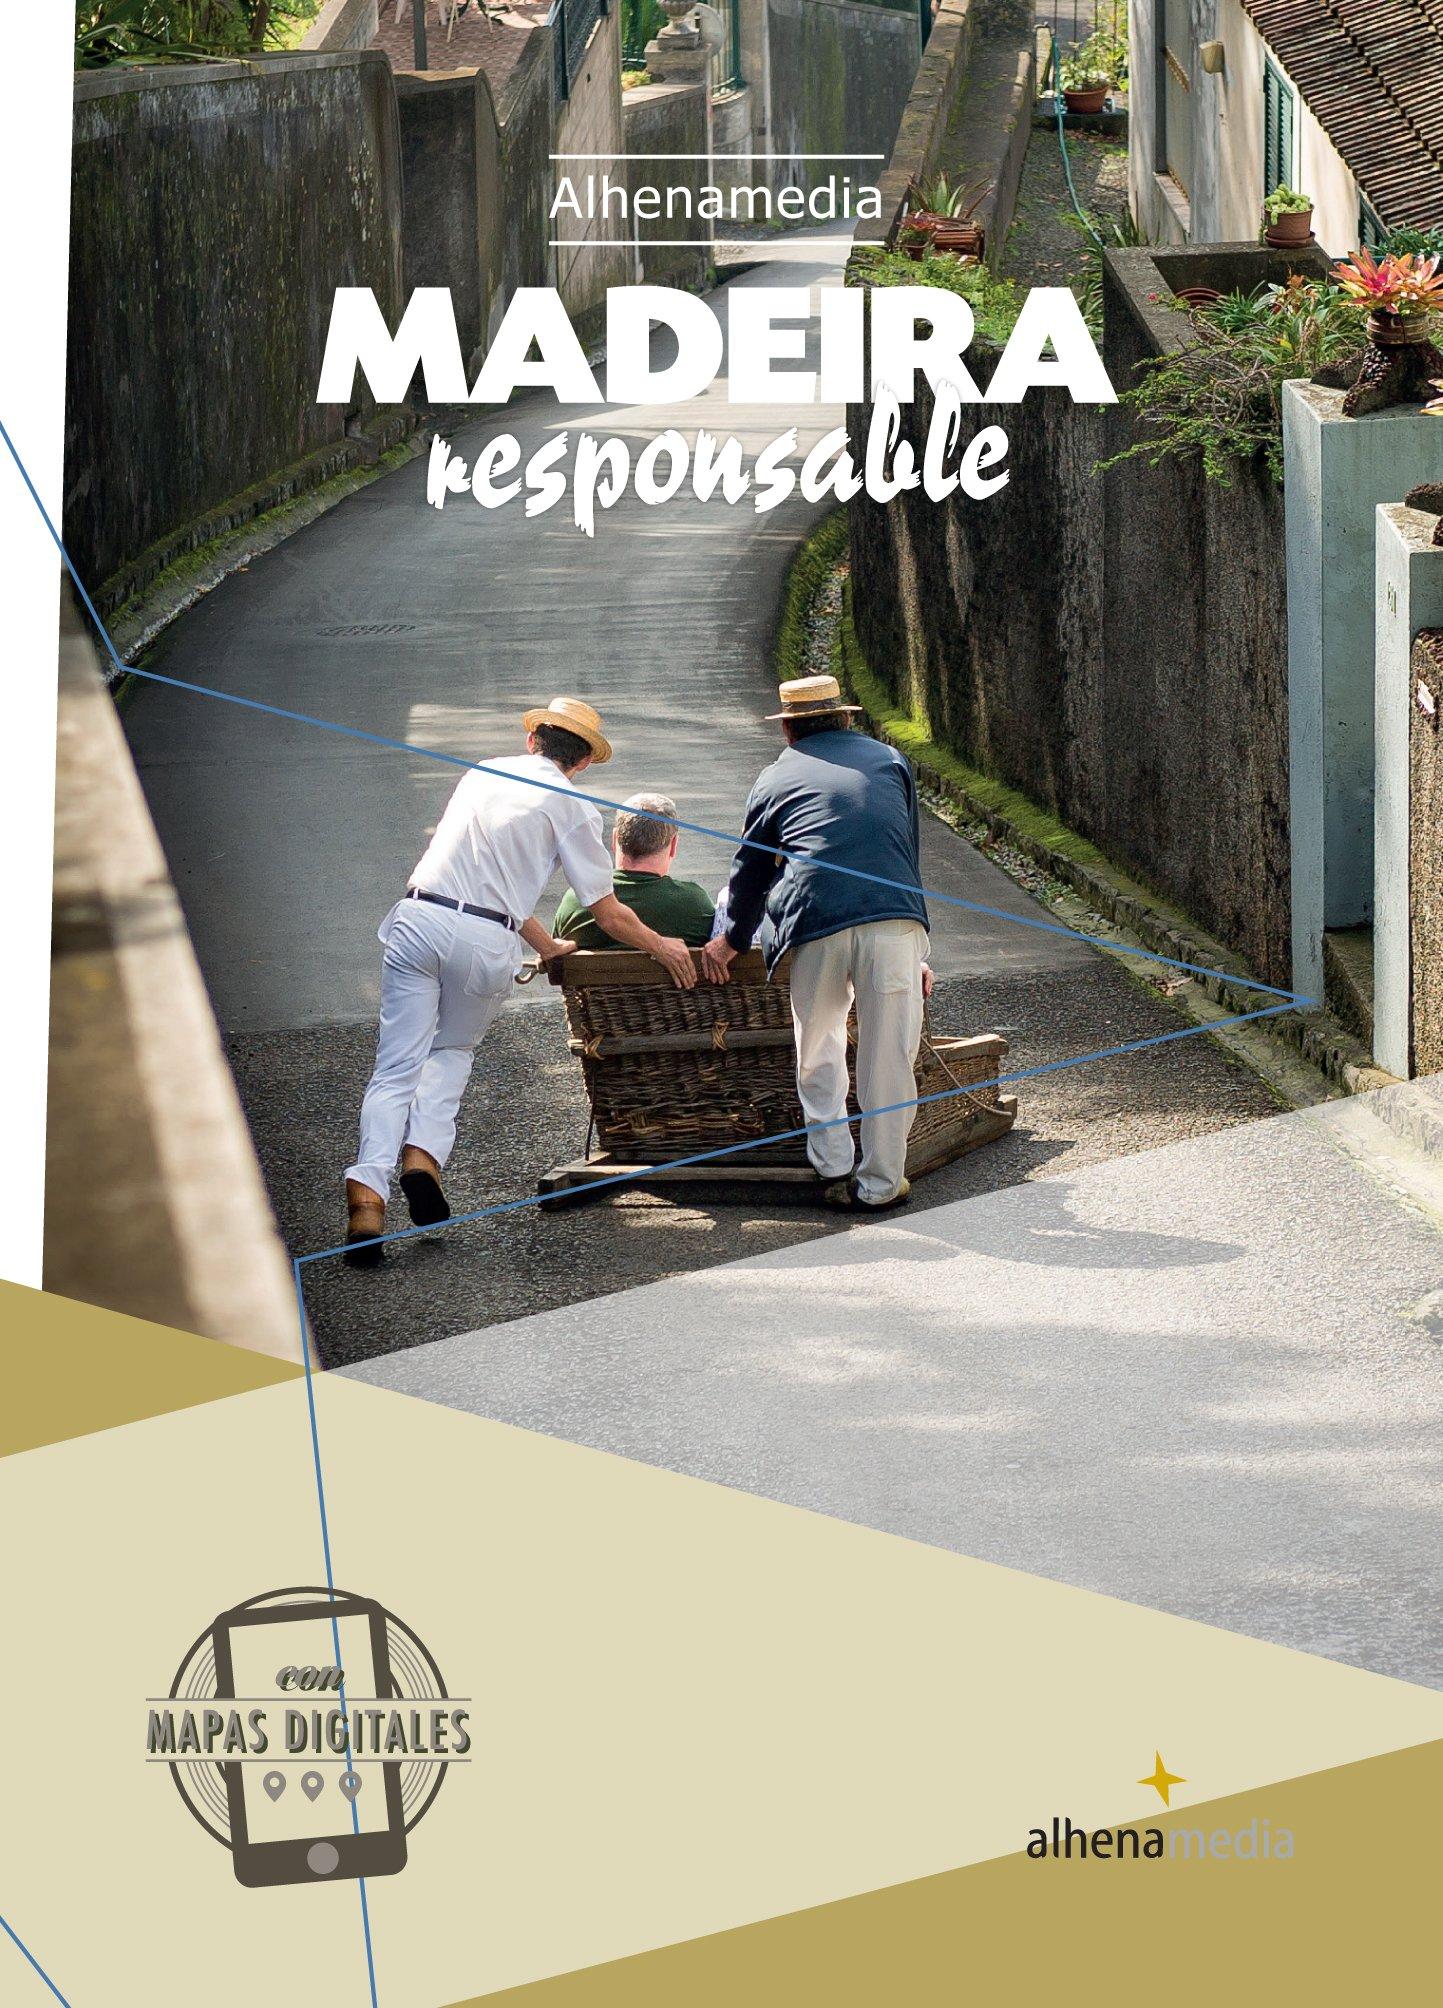 Madeira responsable (Alhenamedia Responsable) Tapa blanda – 21 jun 2017 Joao Coutinho Alhena Fábrica de Contenidos S.L. 8416395233